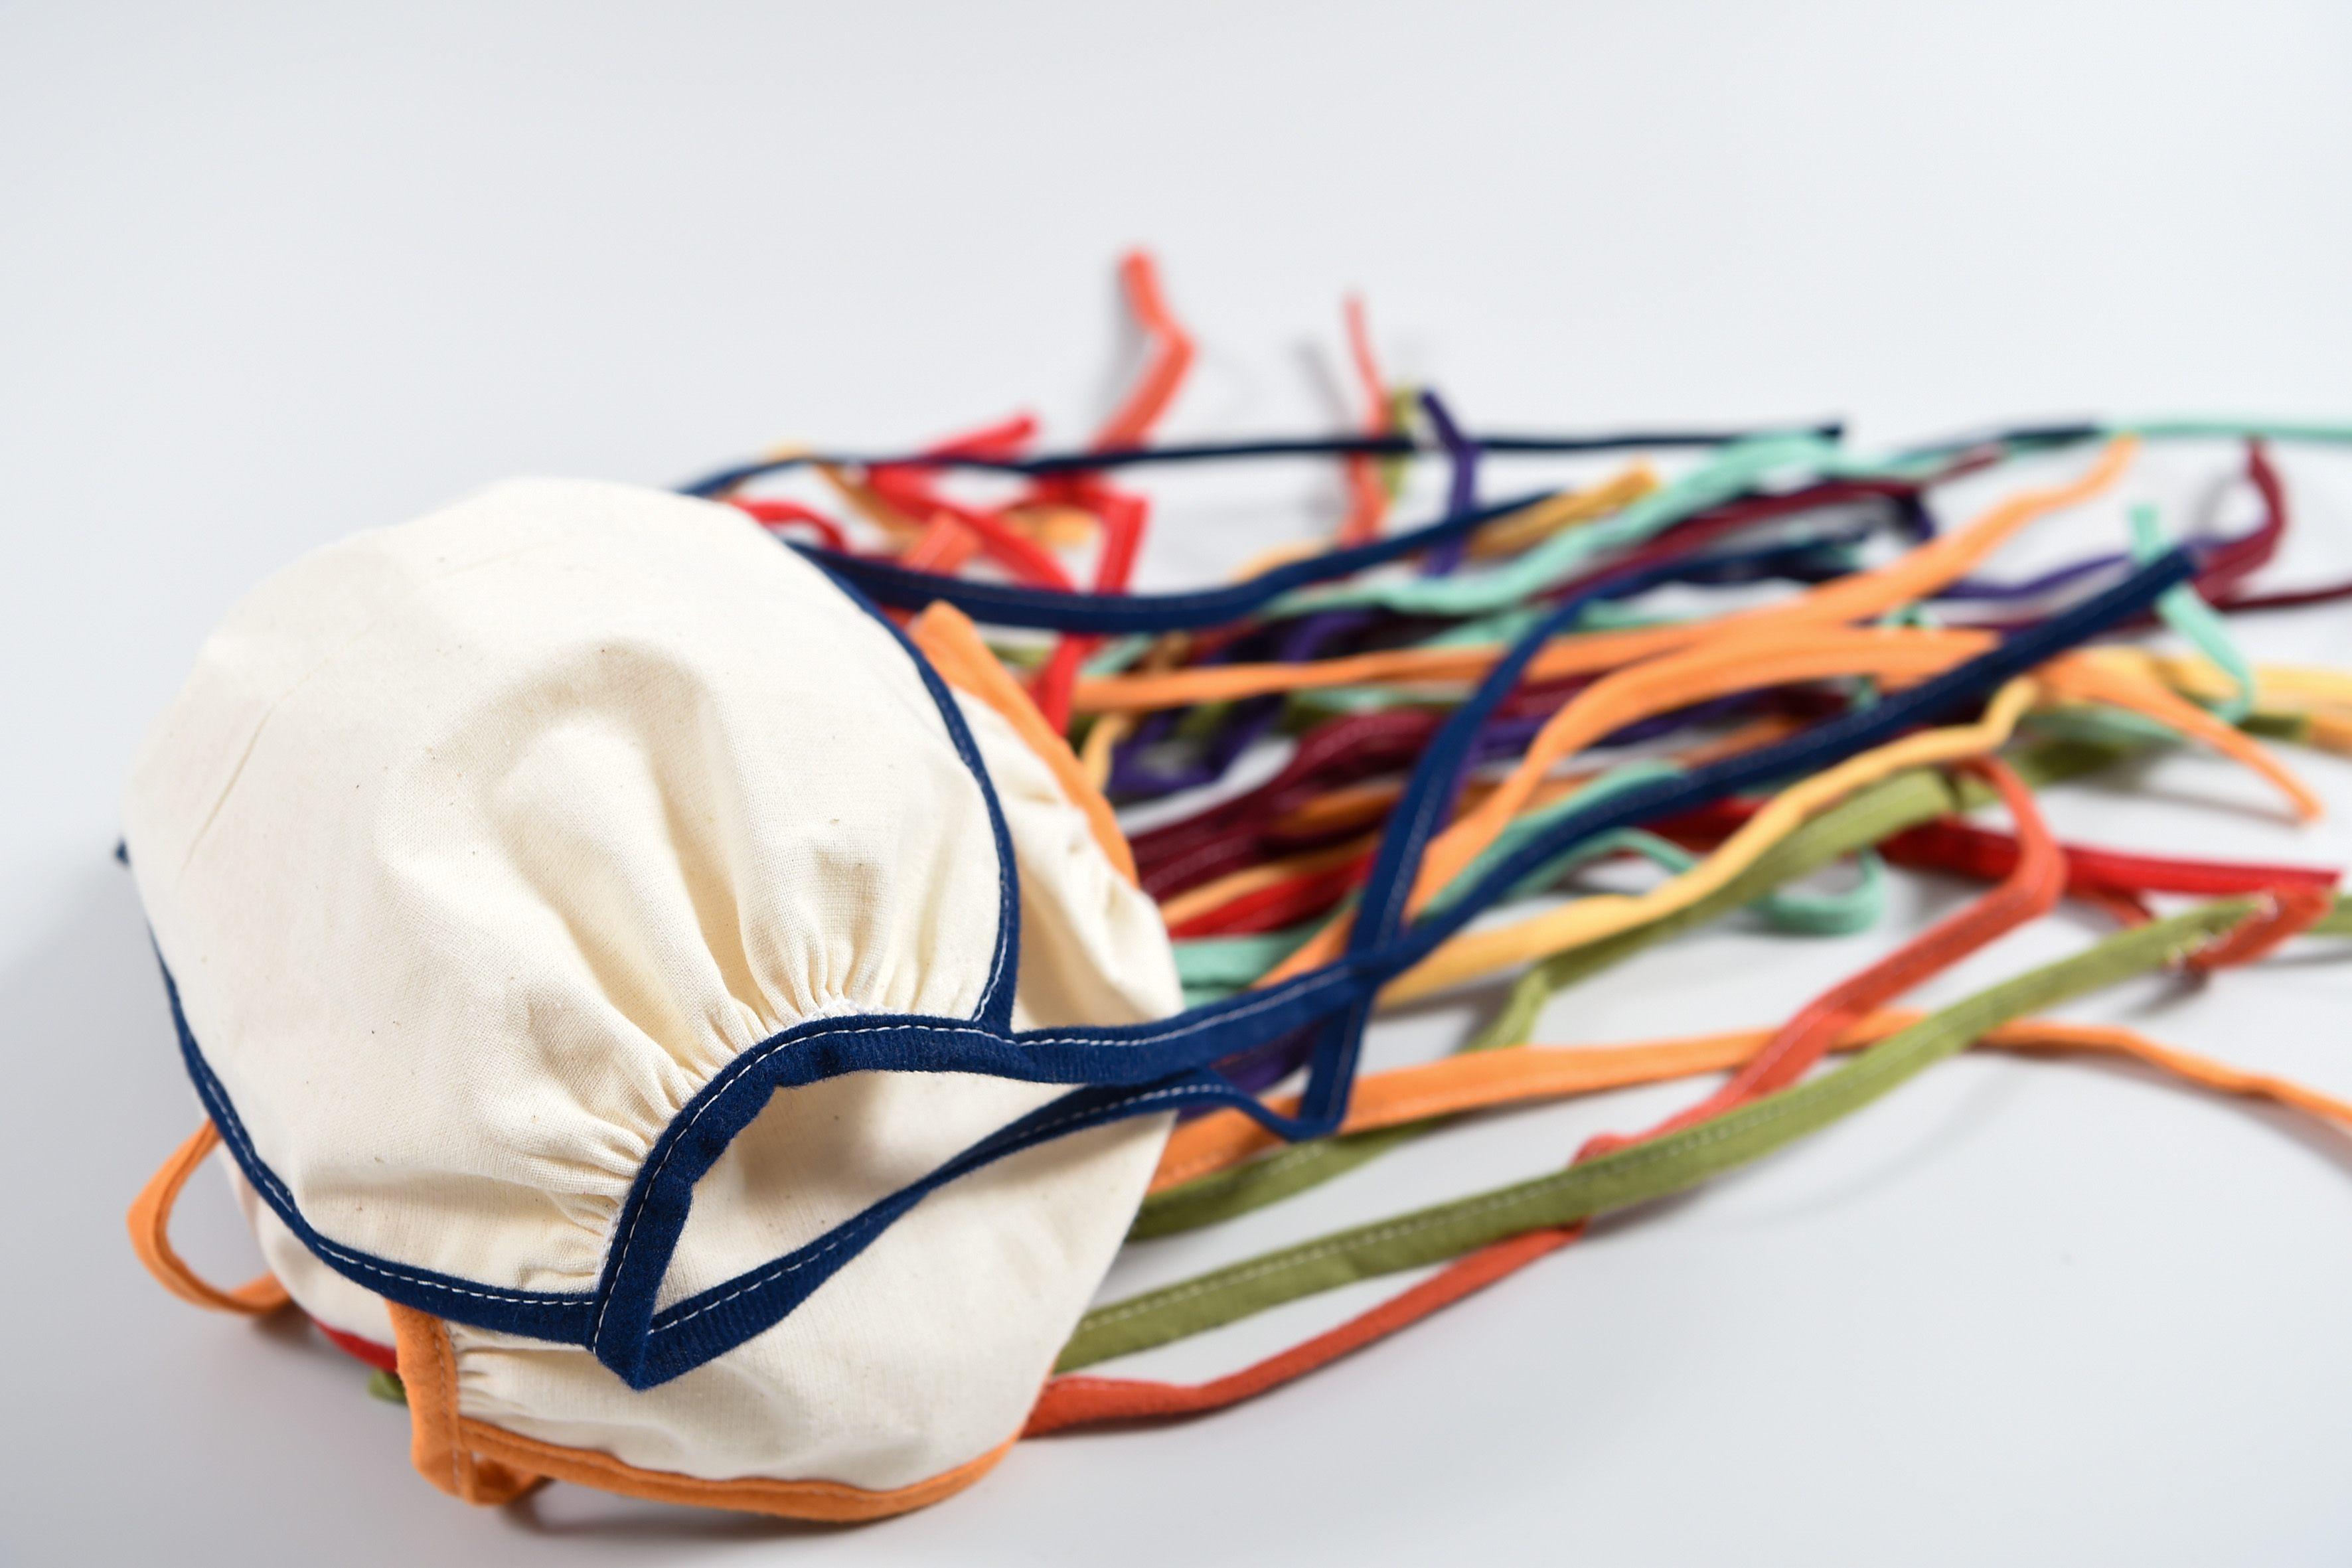 EICKELIT spendet Gewinn aus Maskenverkauf an nebenan.de Stiftung